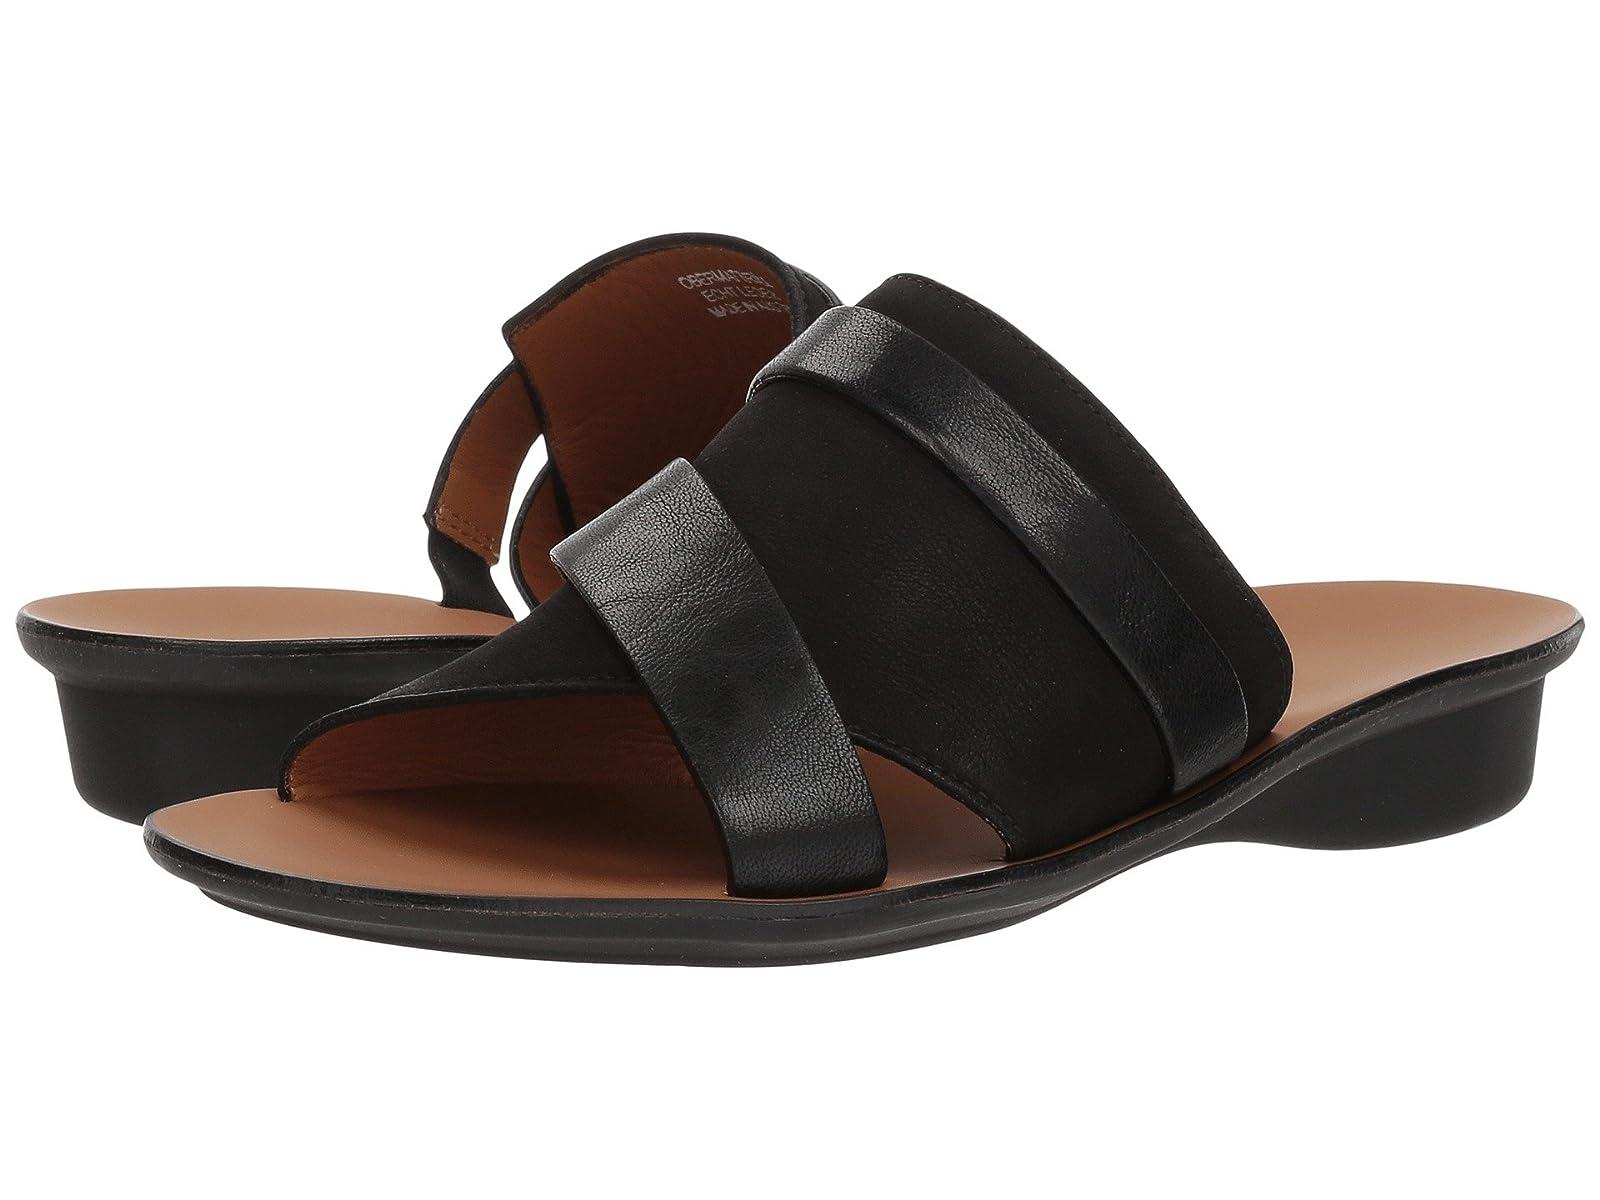 Paul Green BaysideCheap and distinctive eye-catching shoes